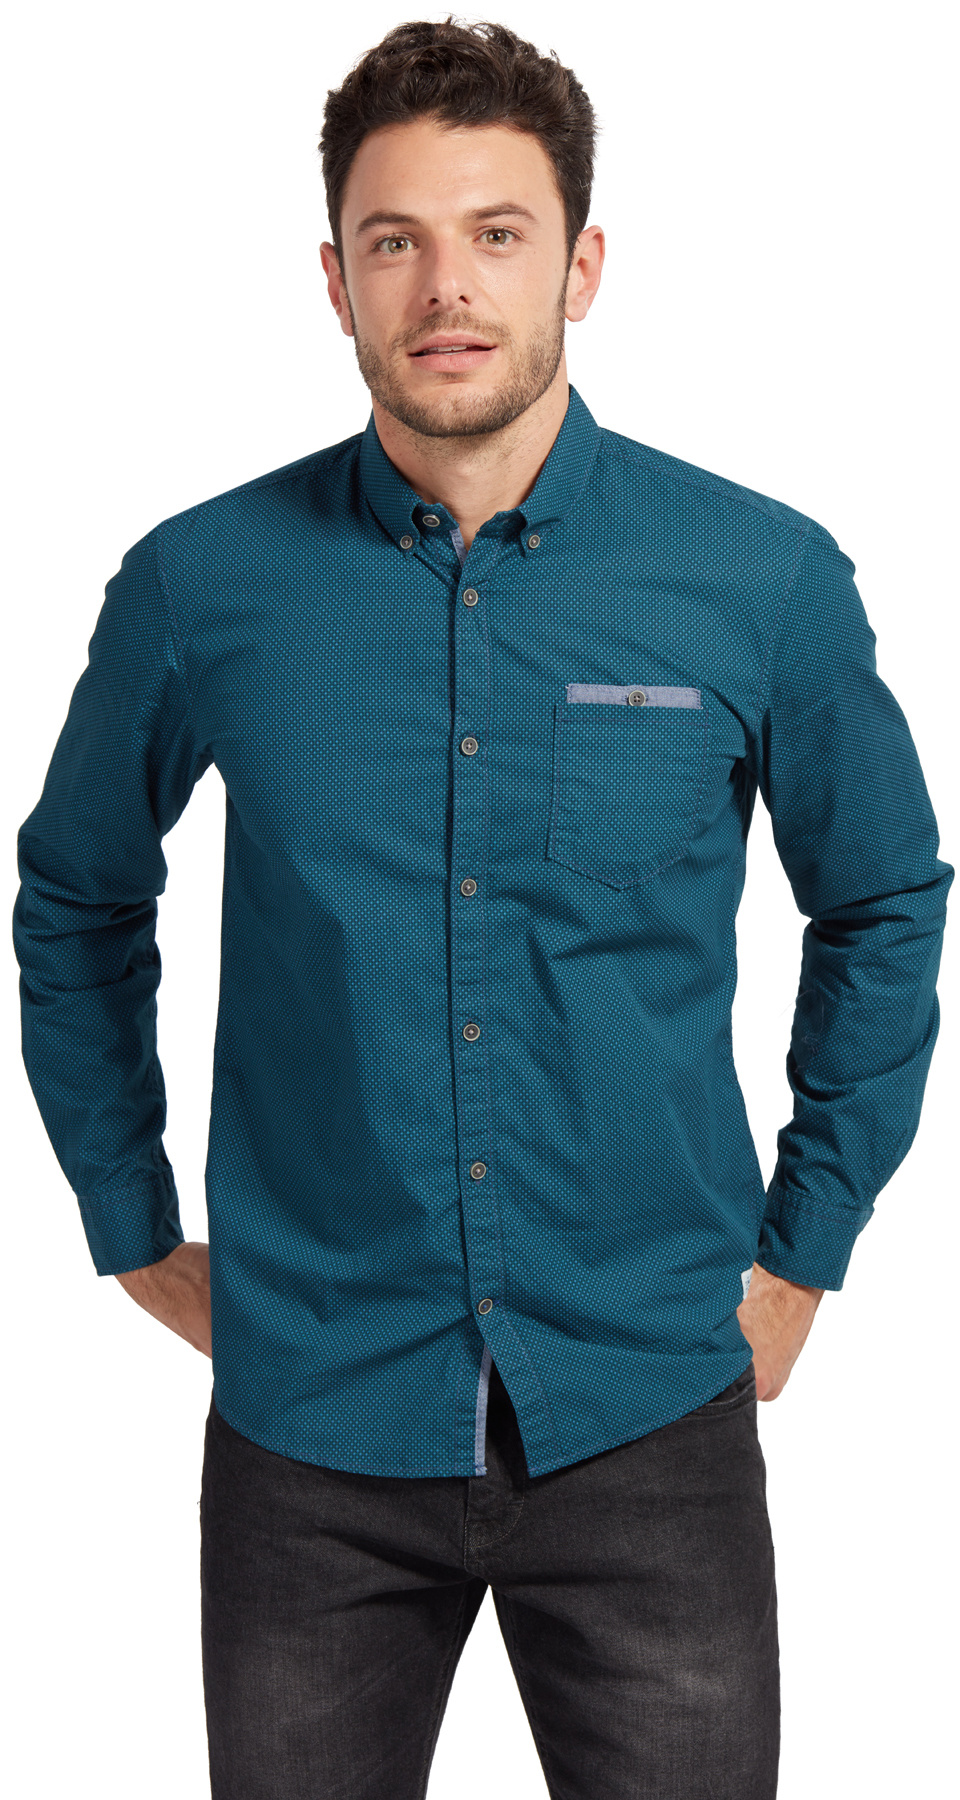 Tom Tailoir pánská košile 20337350010/7812 Zelená XL